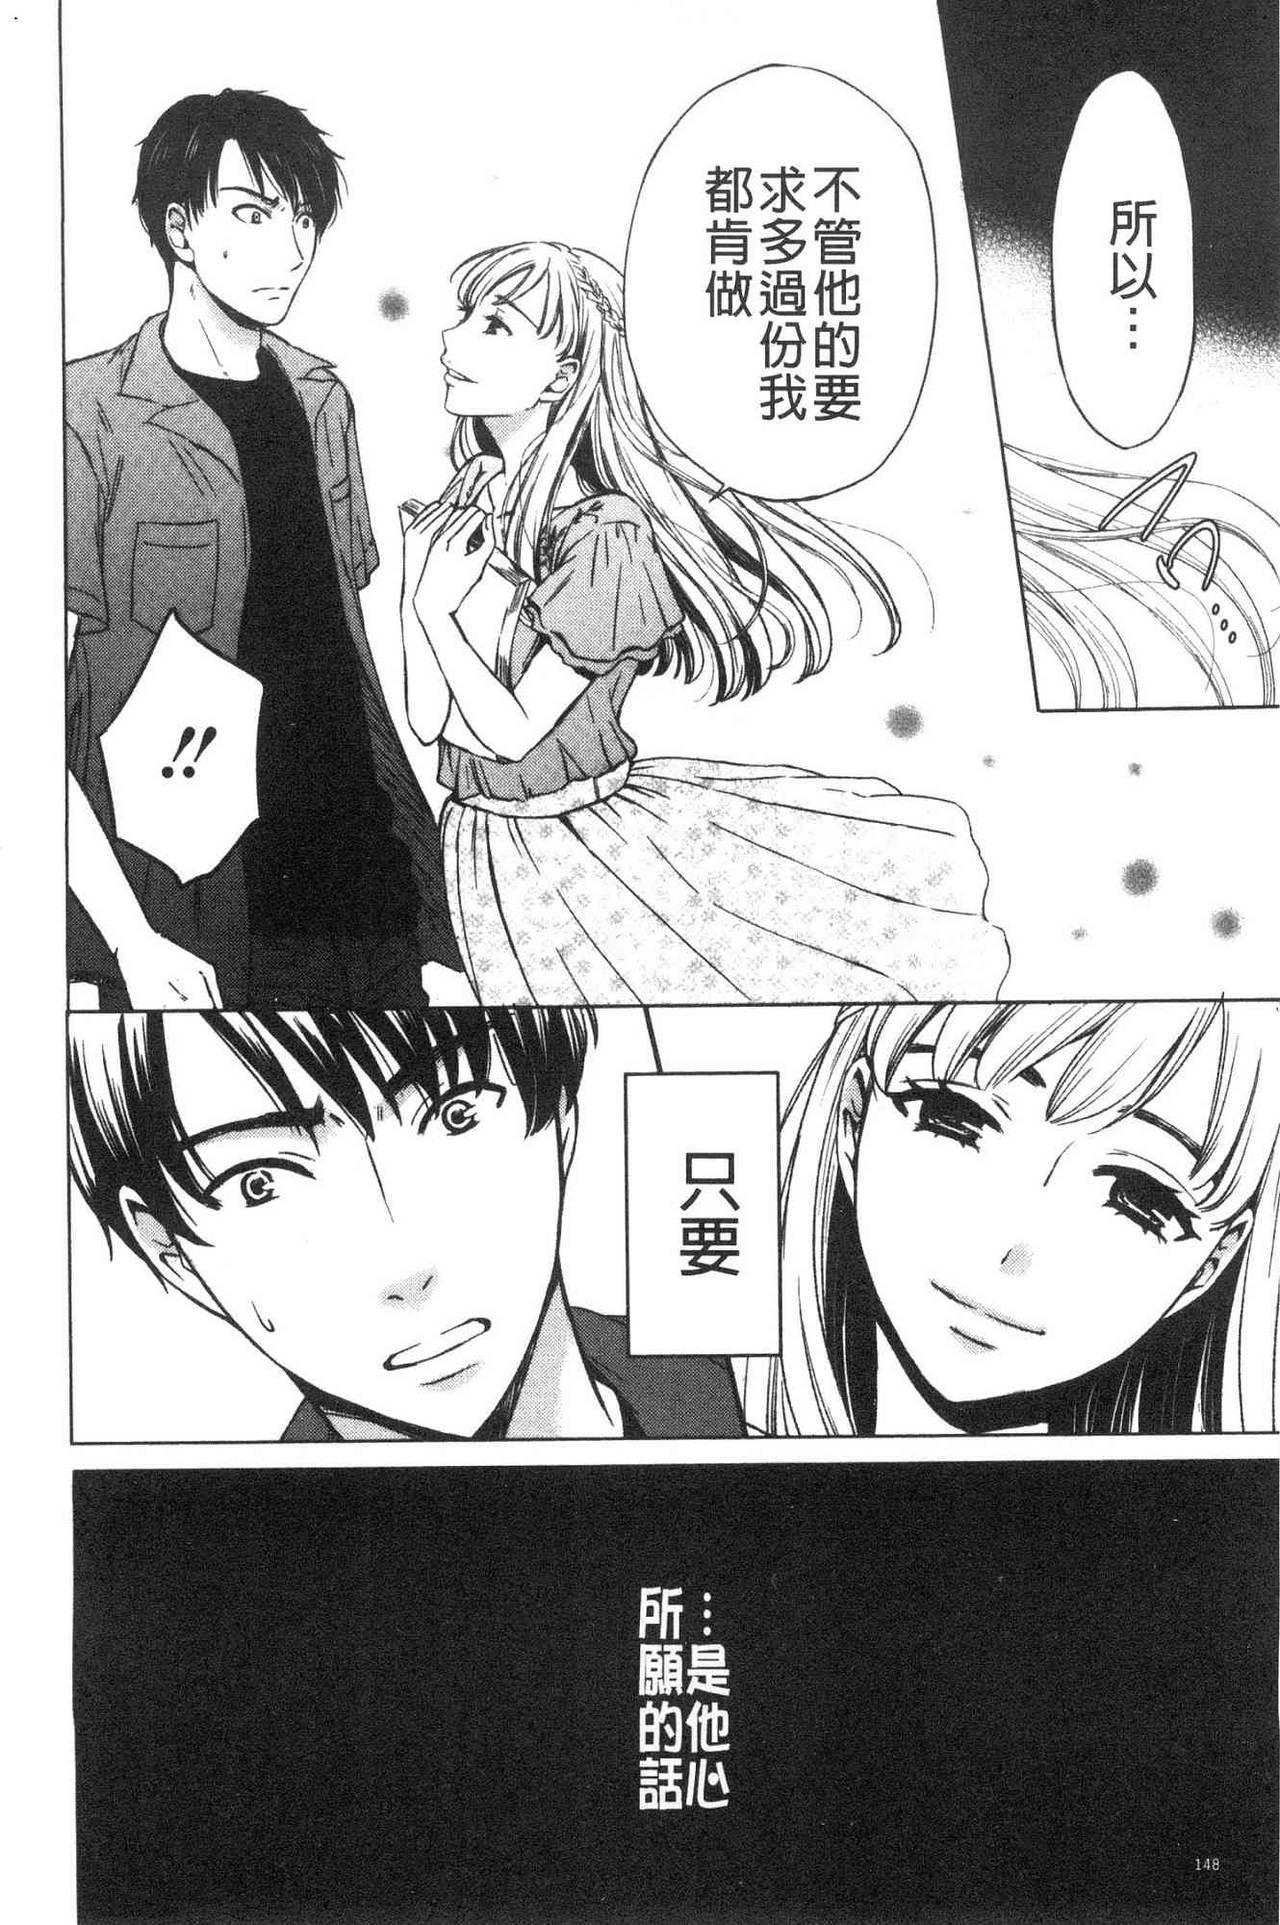 [Gotoh Akira]  21-ji no Onna ~Camera no Mae no Mesuinu~ 2 | 21時之女 ~鏡頭前的牝犬~ 2 [Chinese] 149